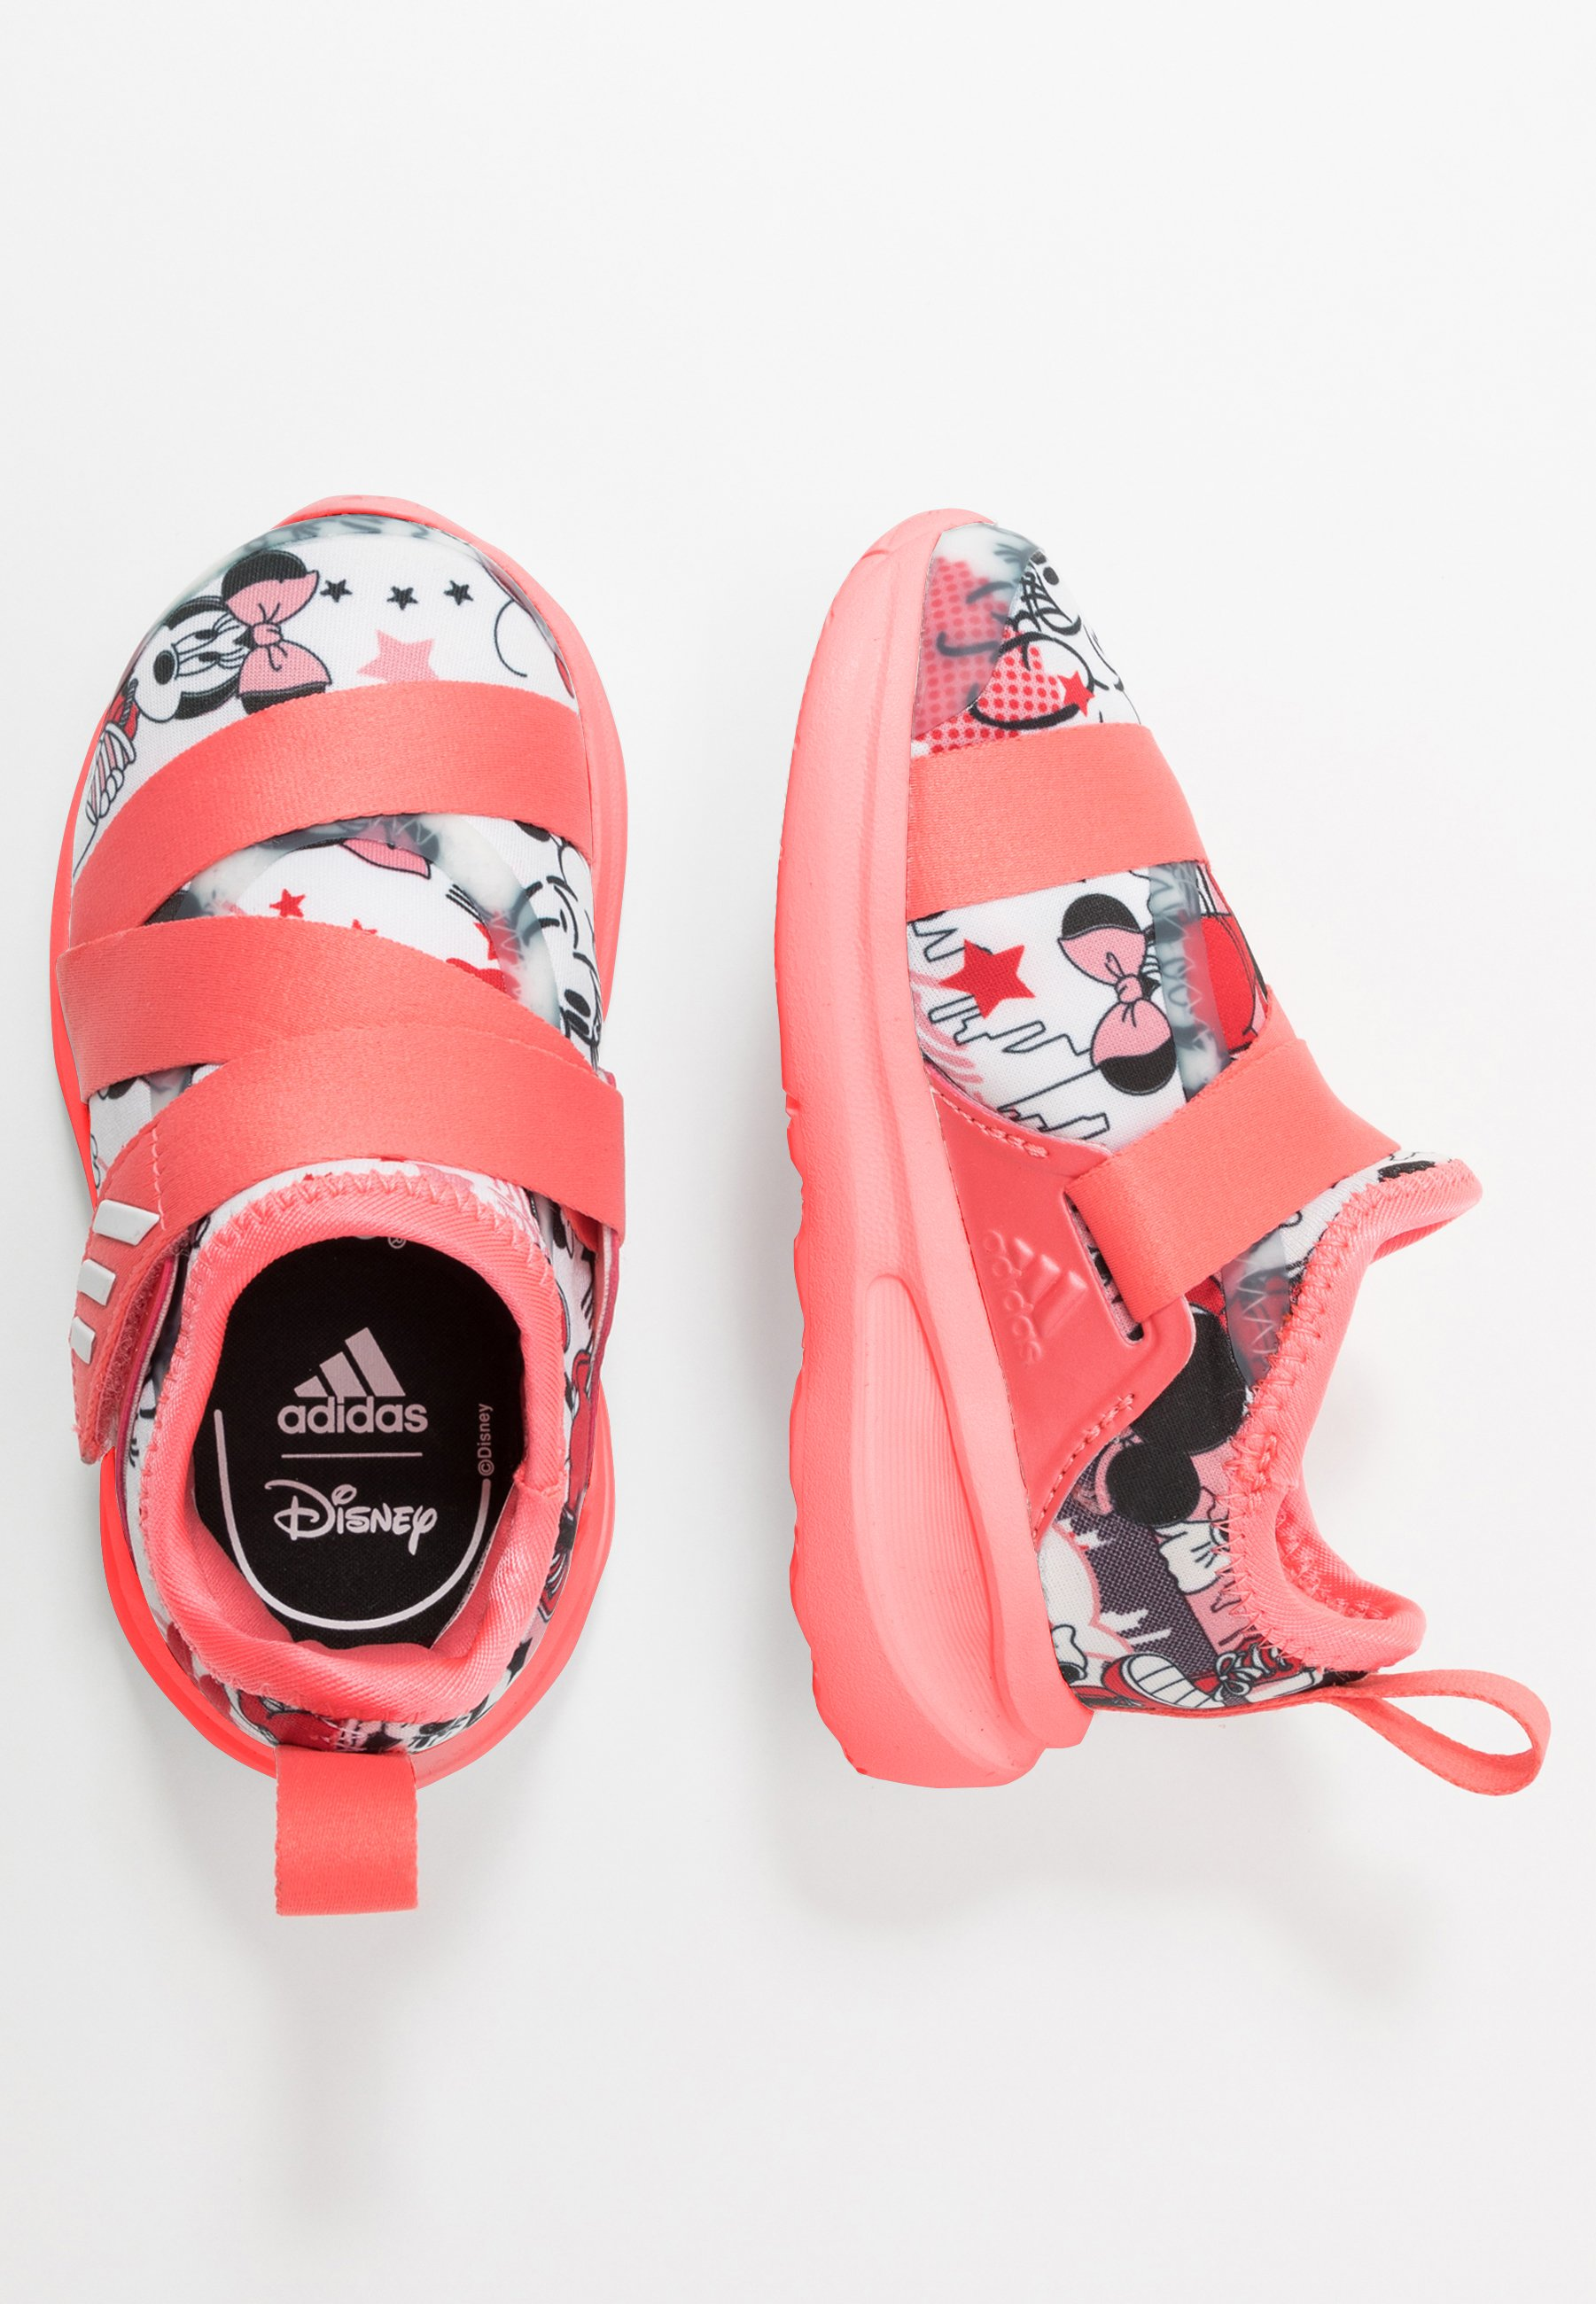 adidas Performance FORTARUN X MINNIE - Chaussures de ...